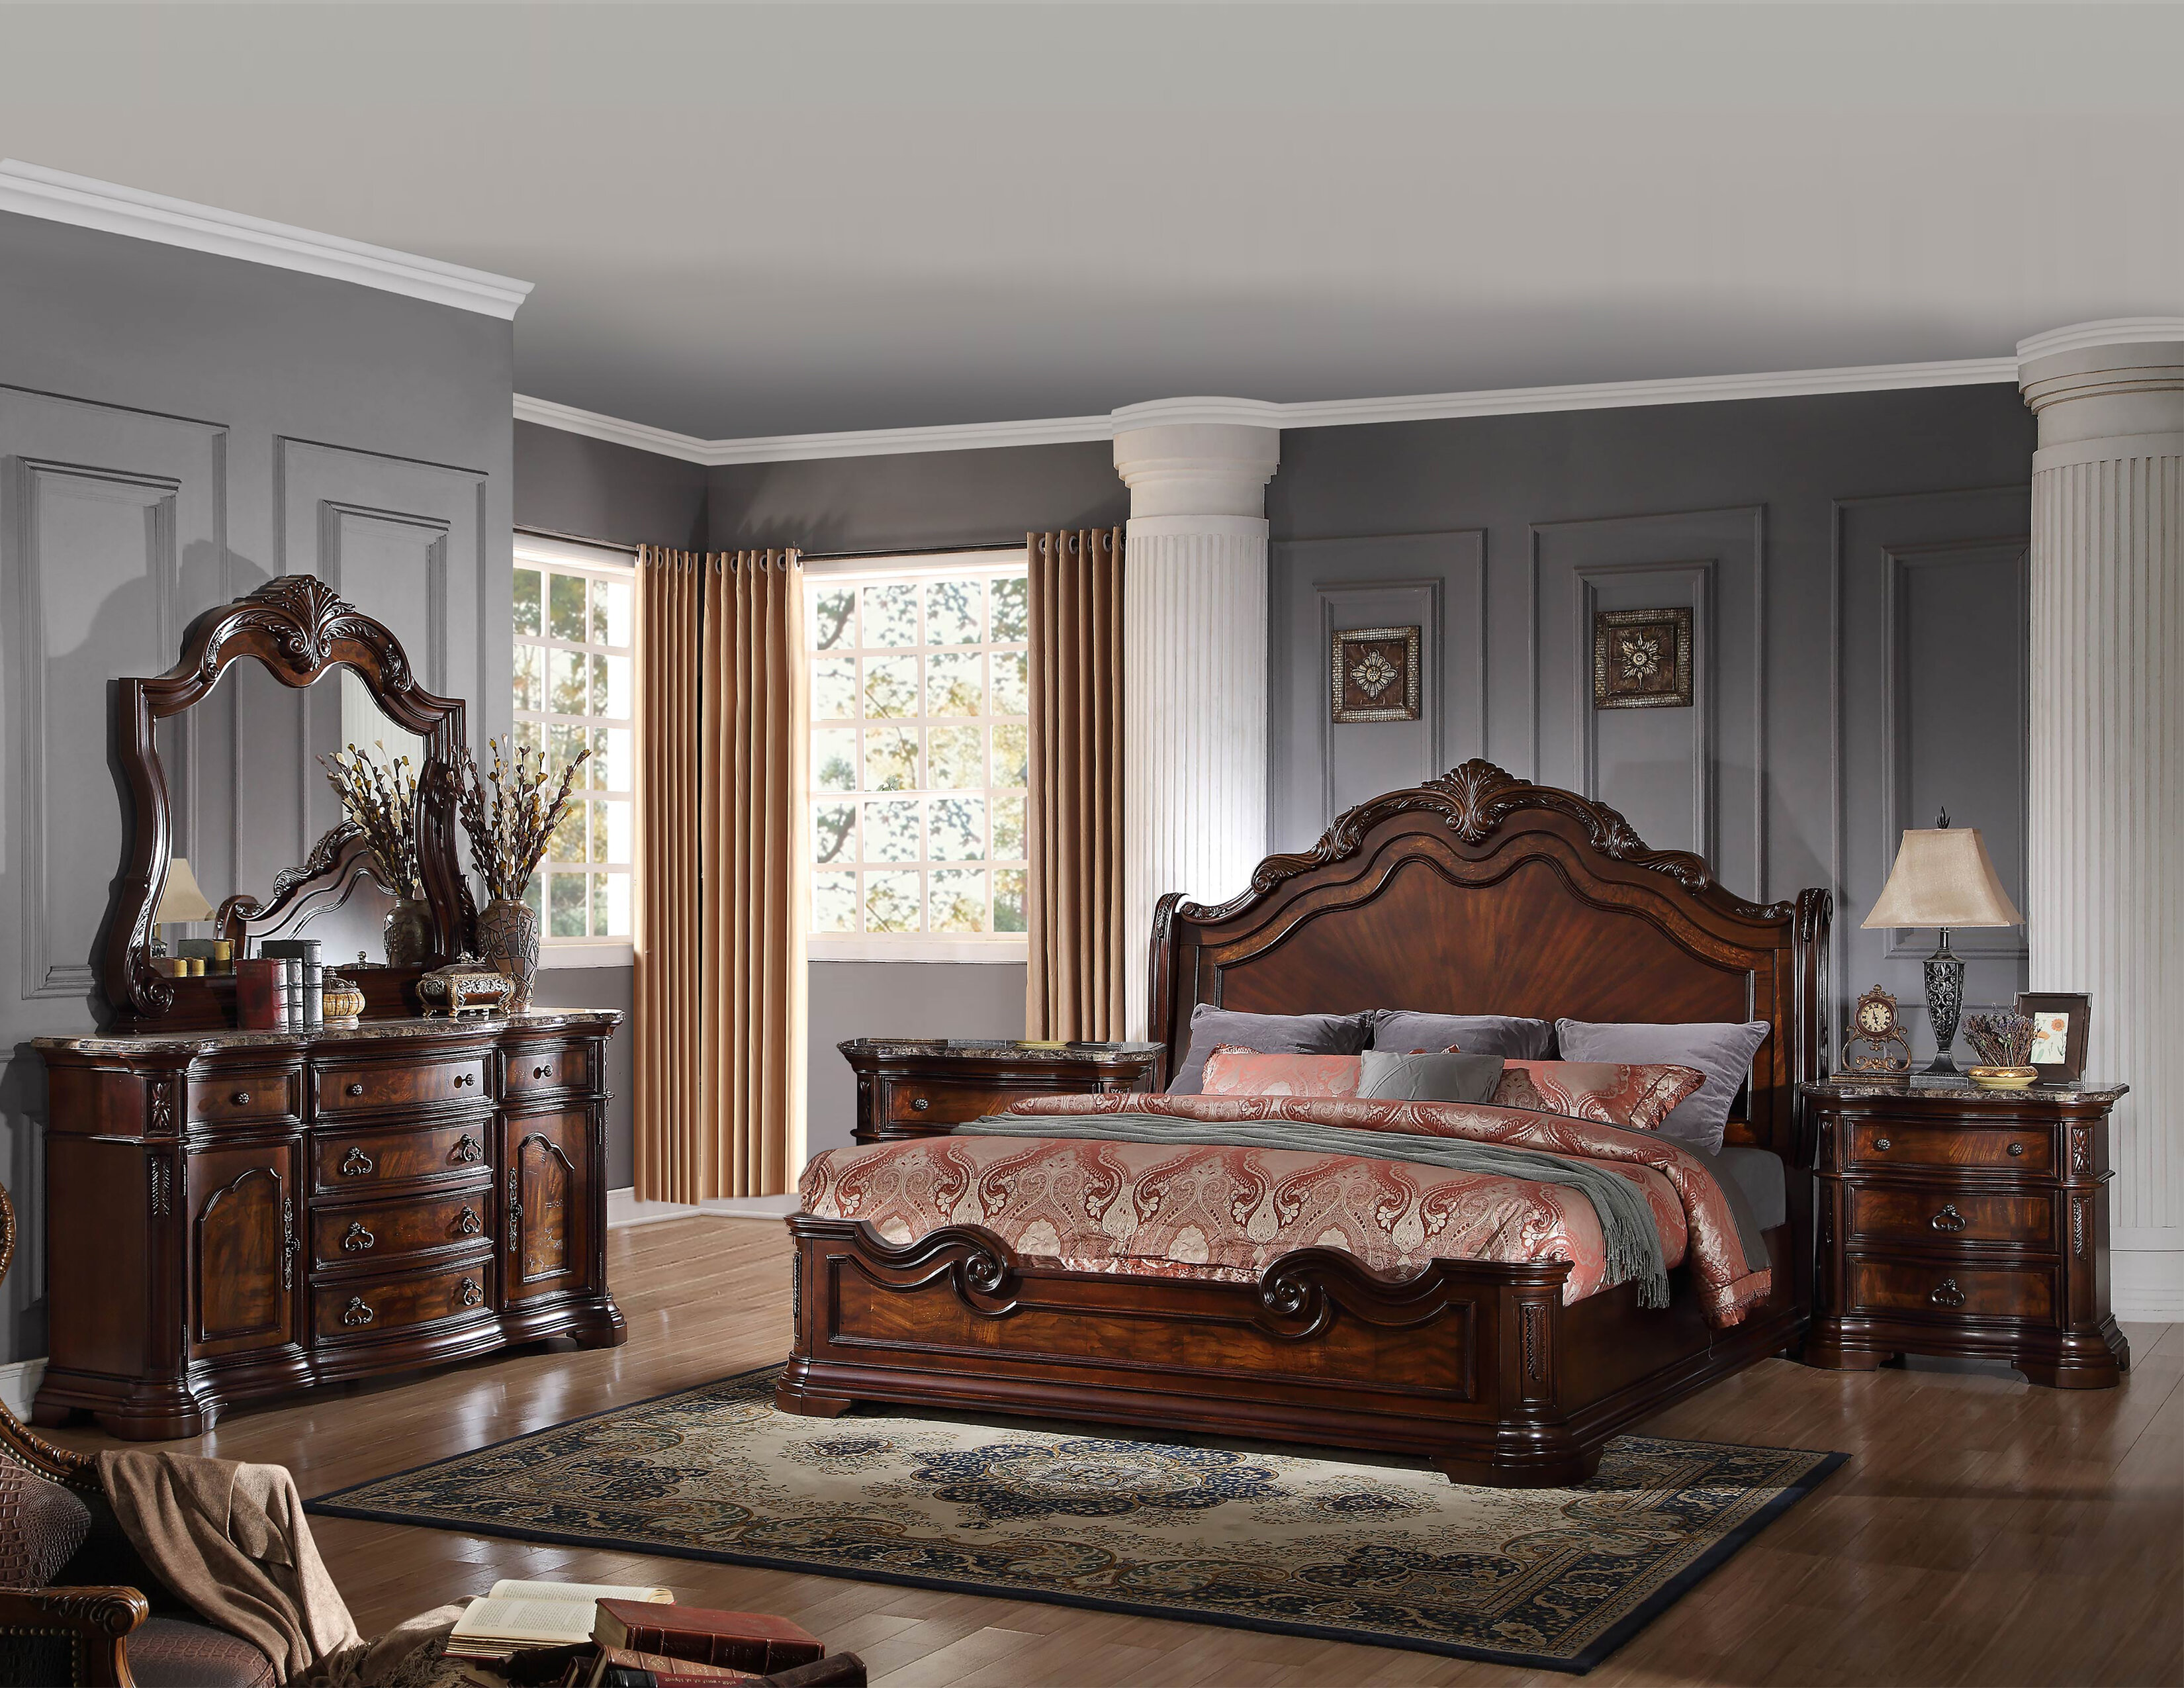 Astoria Grand Bedroom Sets Free Shipping Over 35 Wayfair